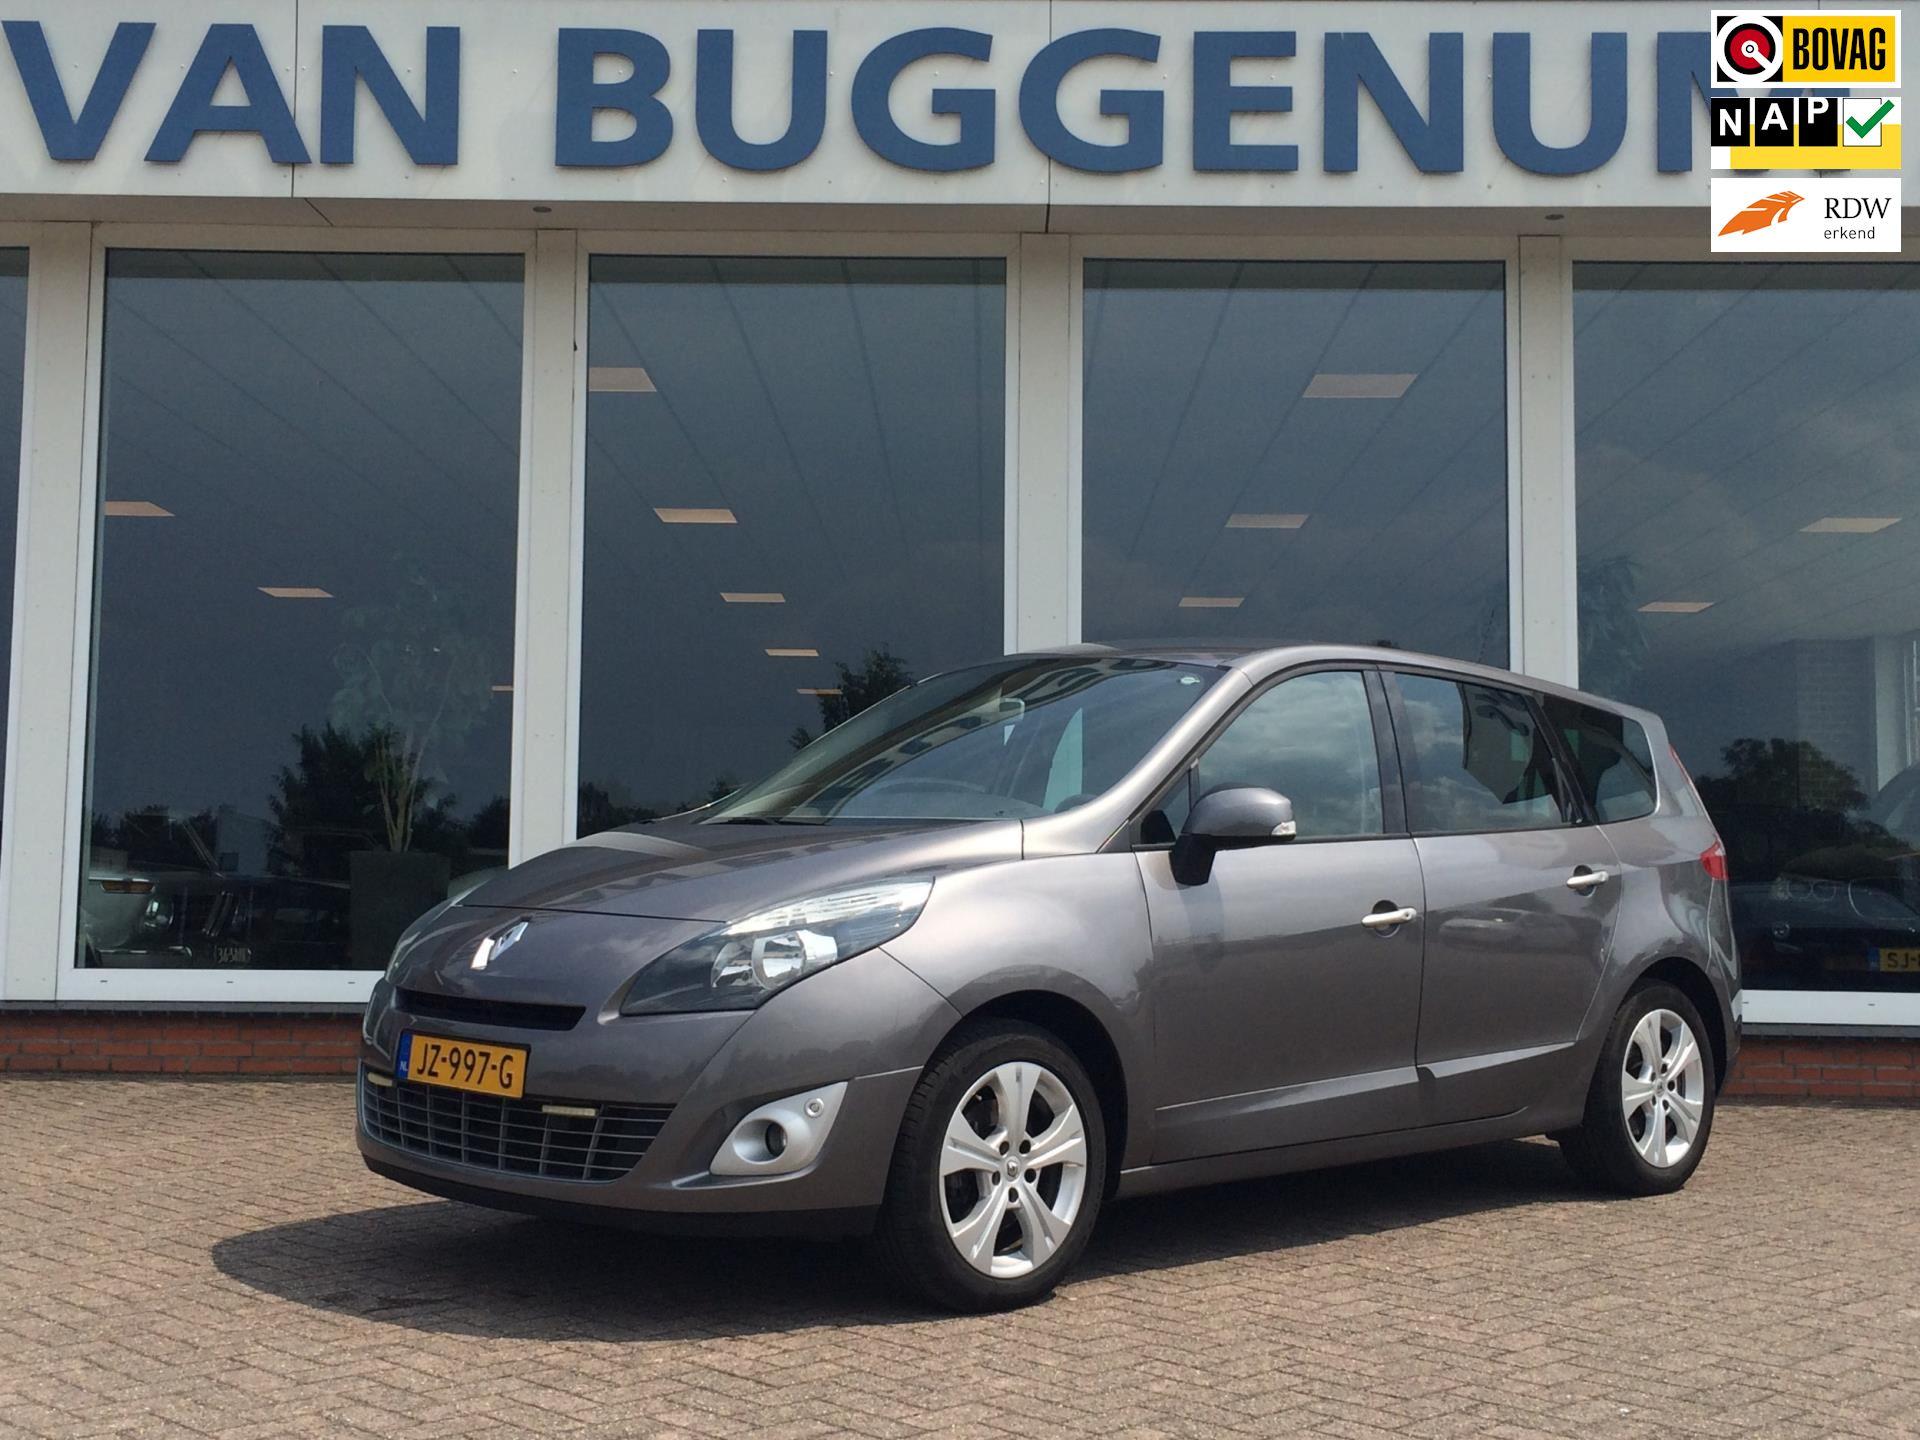 Renault Grand Scénic occasion - Automobielbedrijf J. van Buggenum